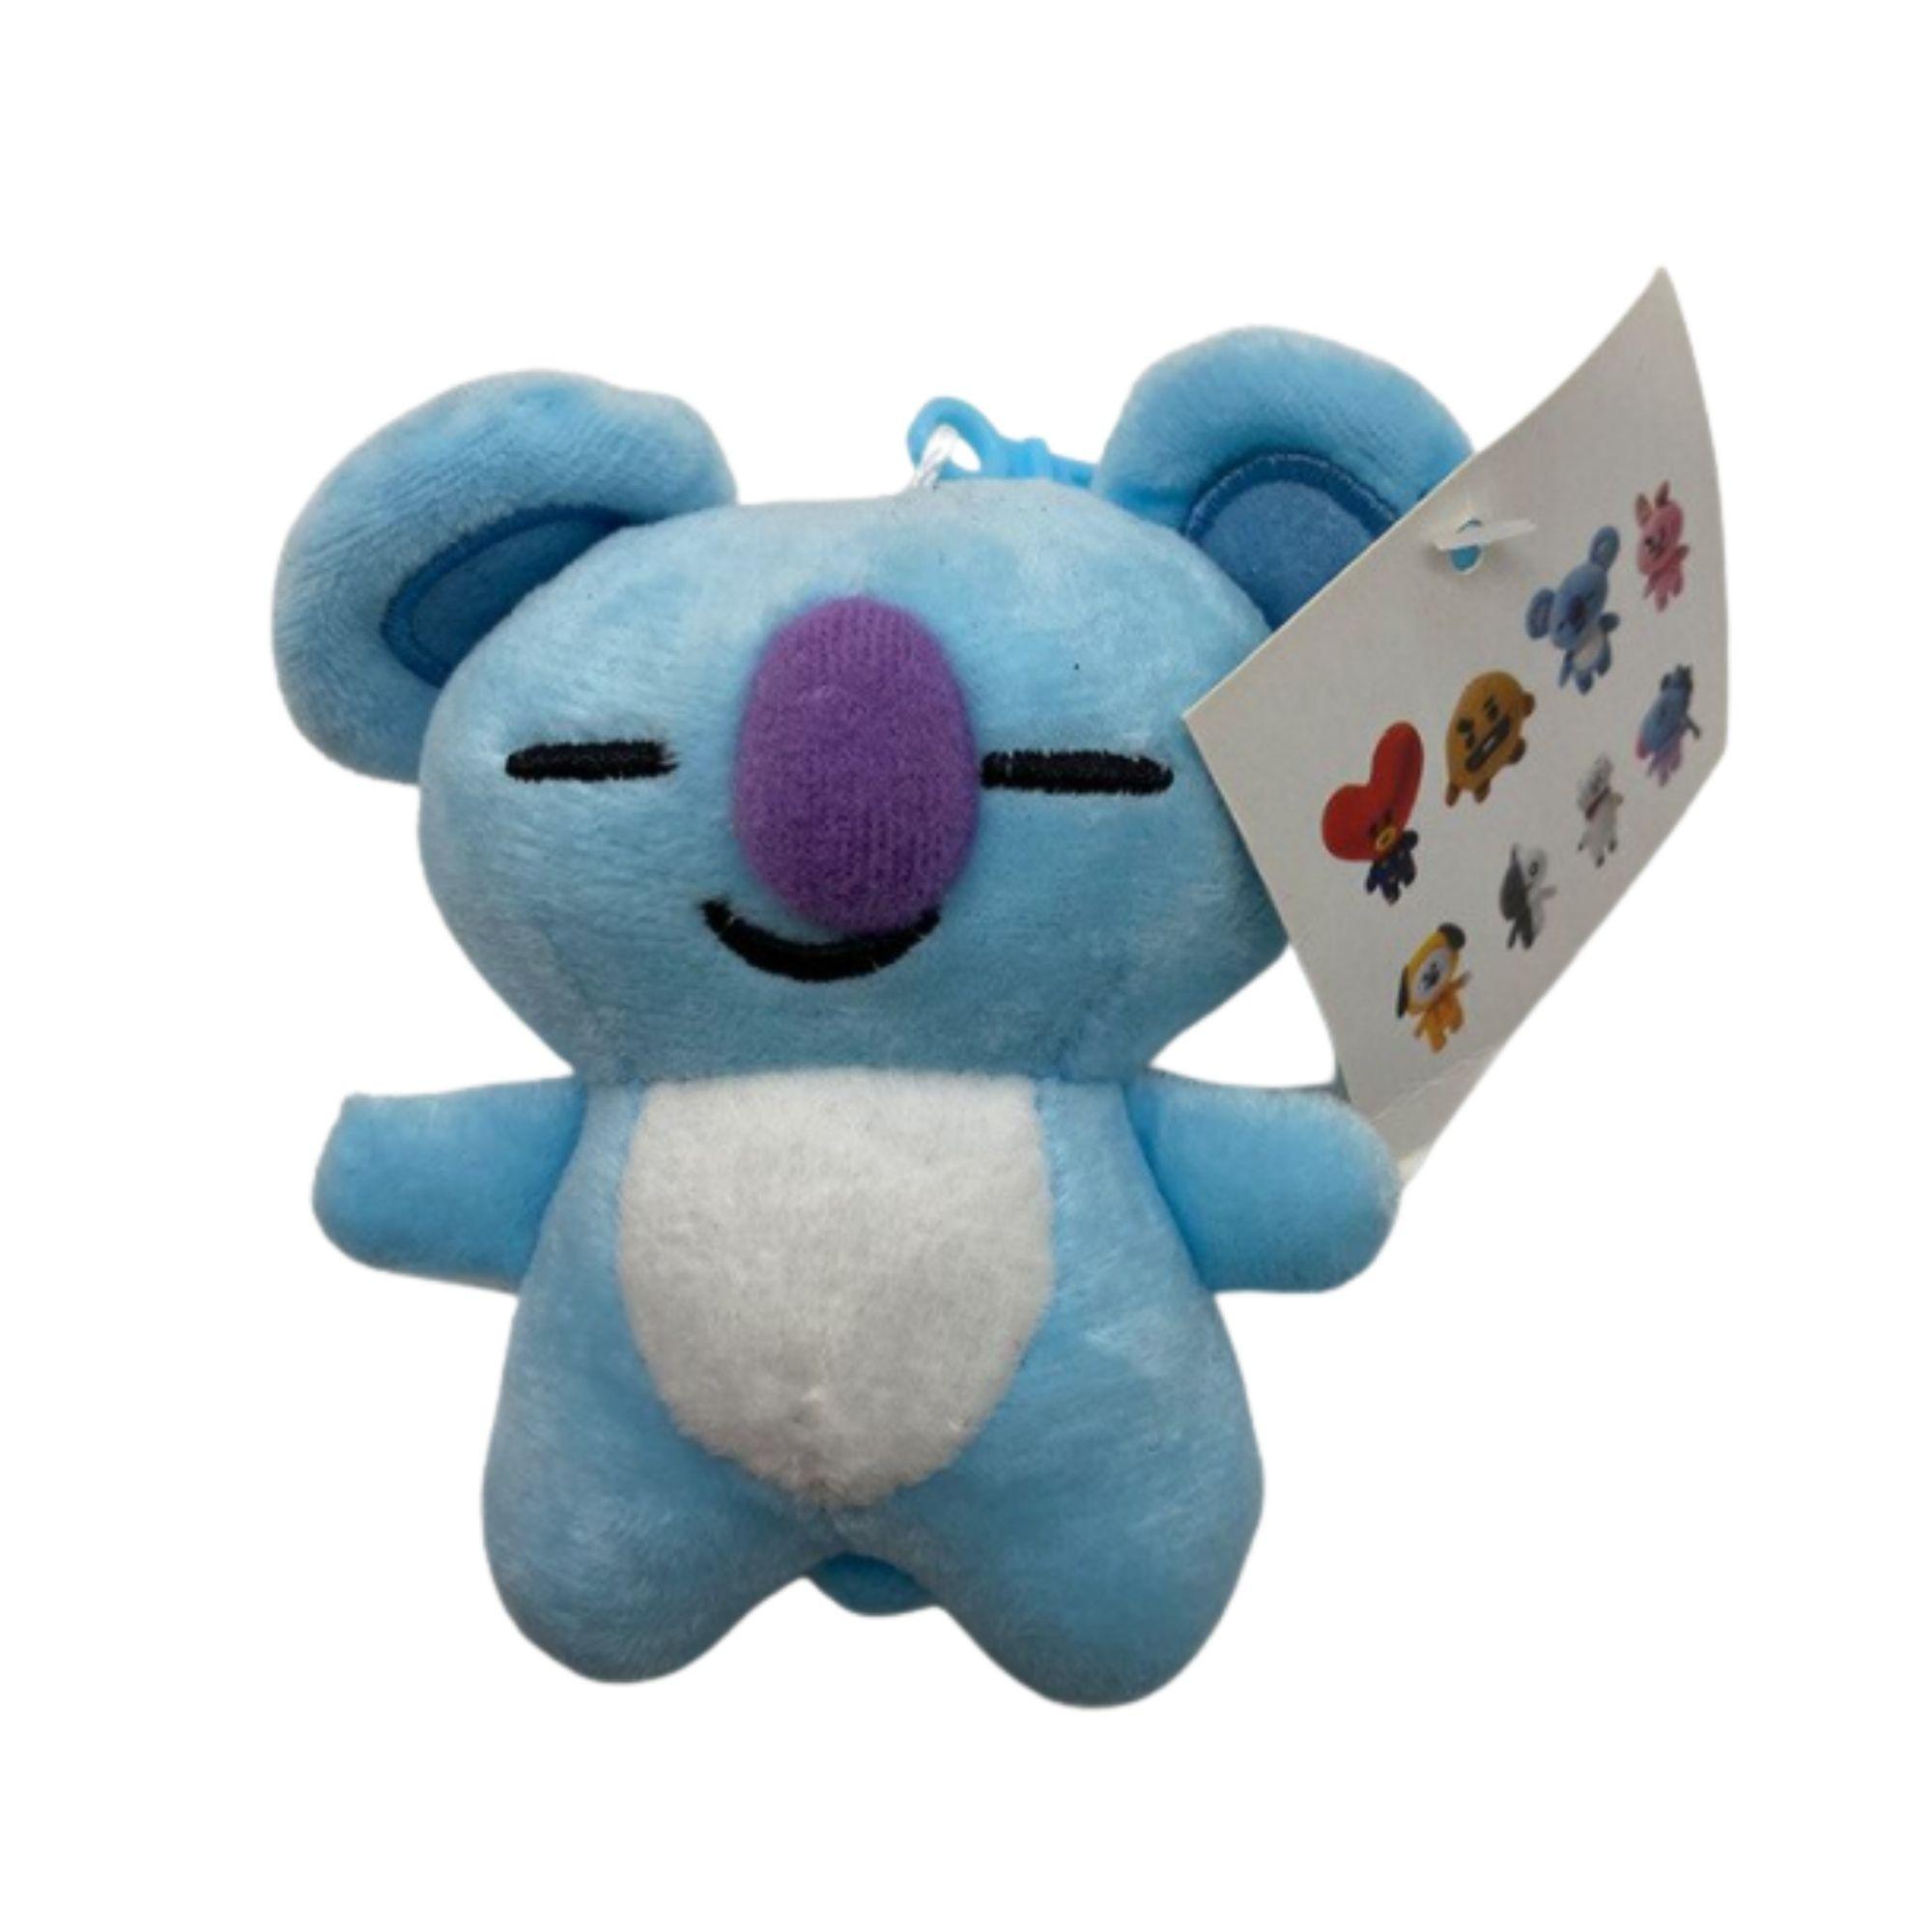 BTS 21 Chaveiro para Mochila Personagens KPop, Koya, Shooky, RJ, Mang  - Game Land Brinquedos